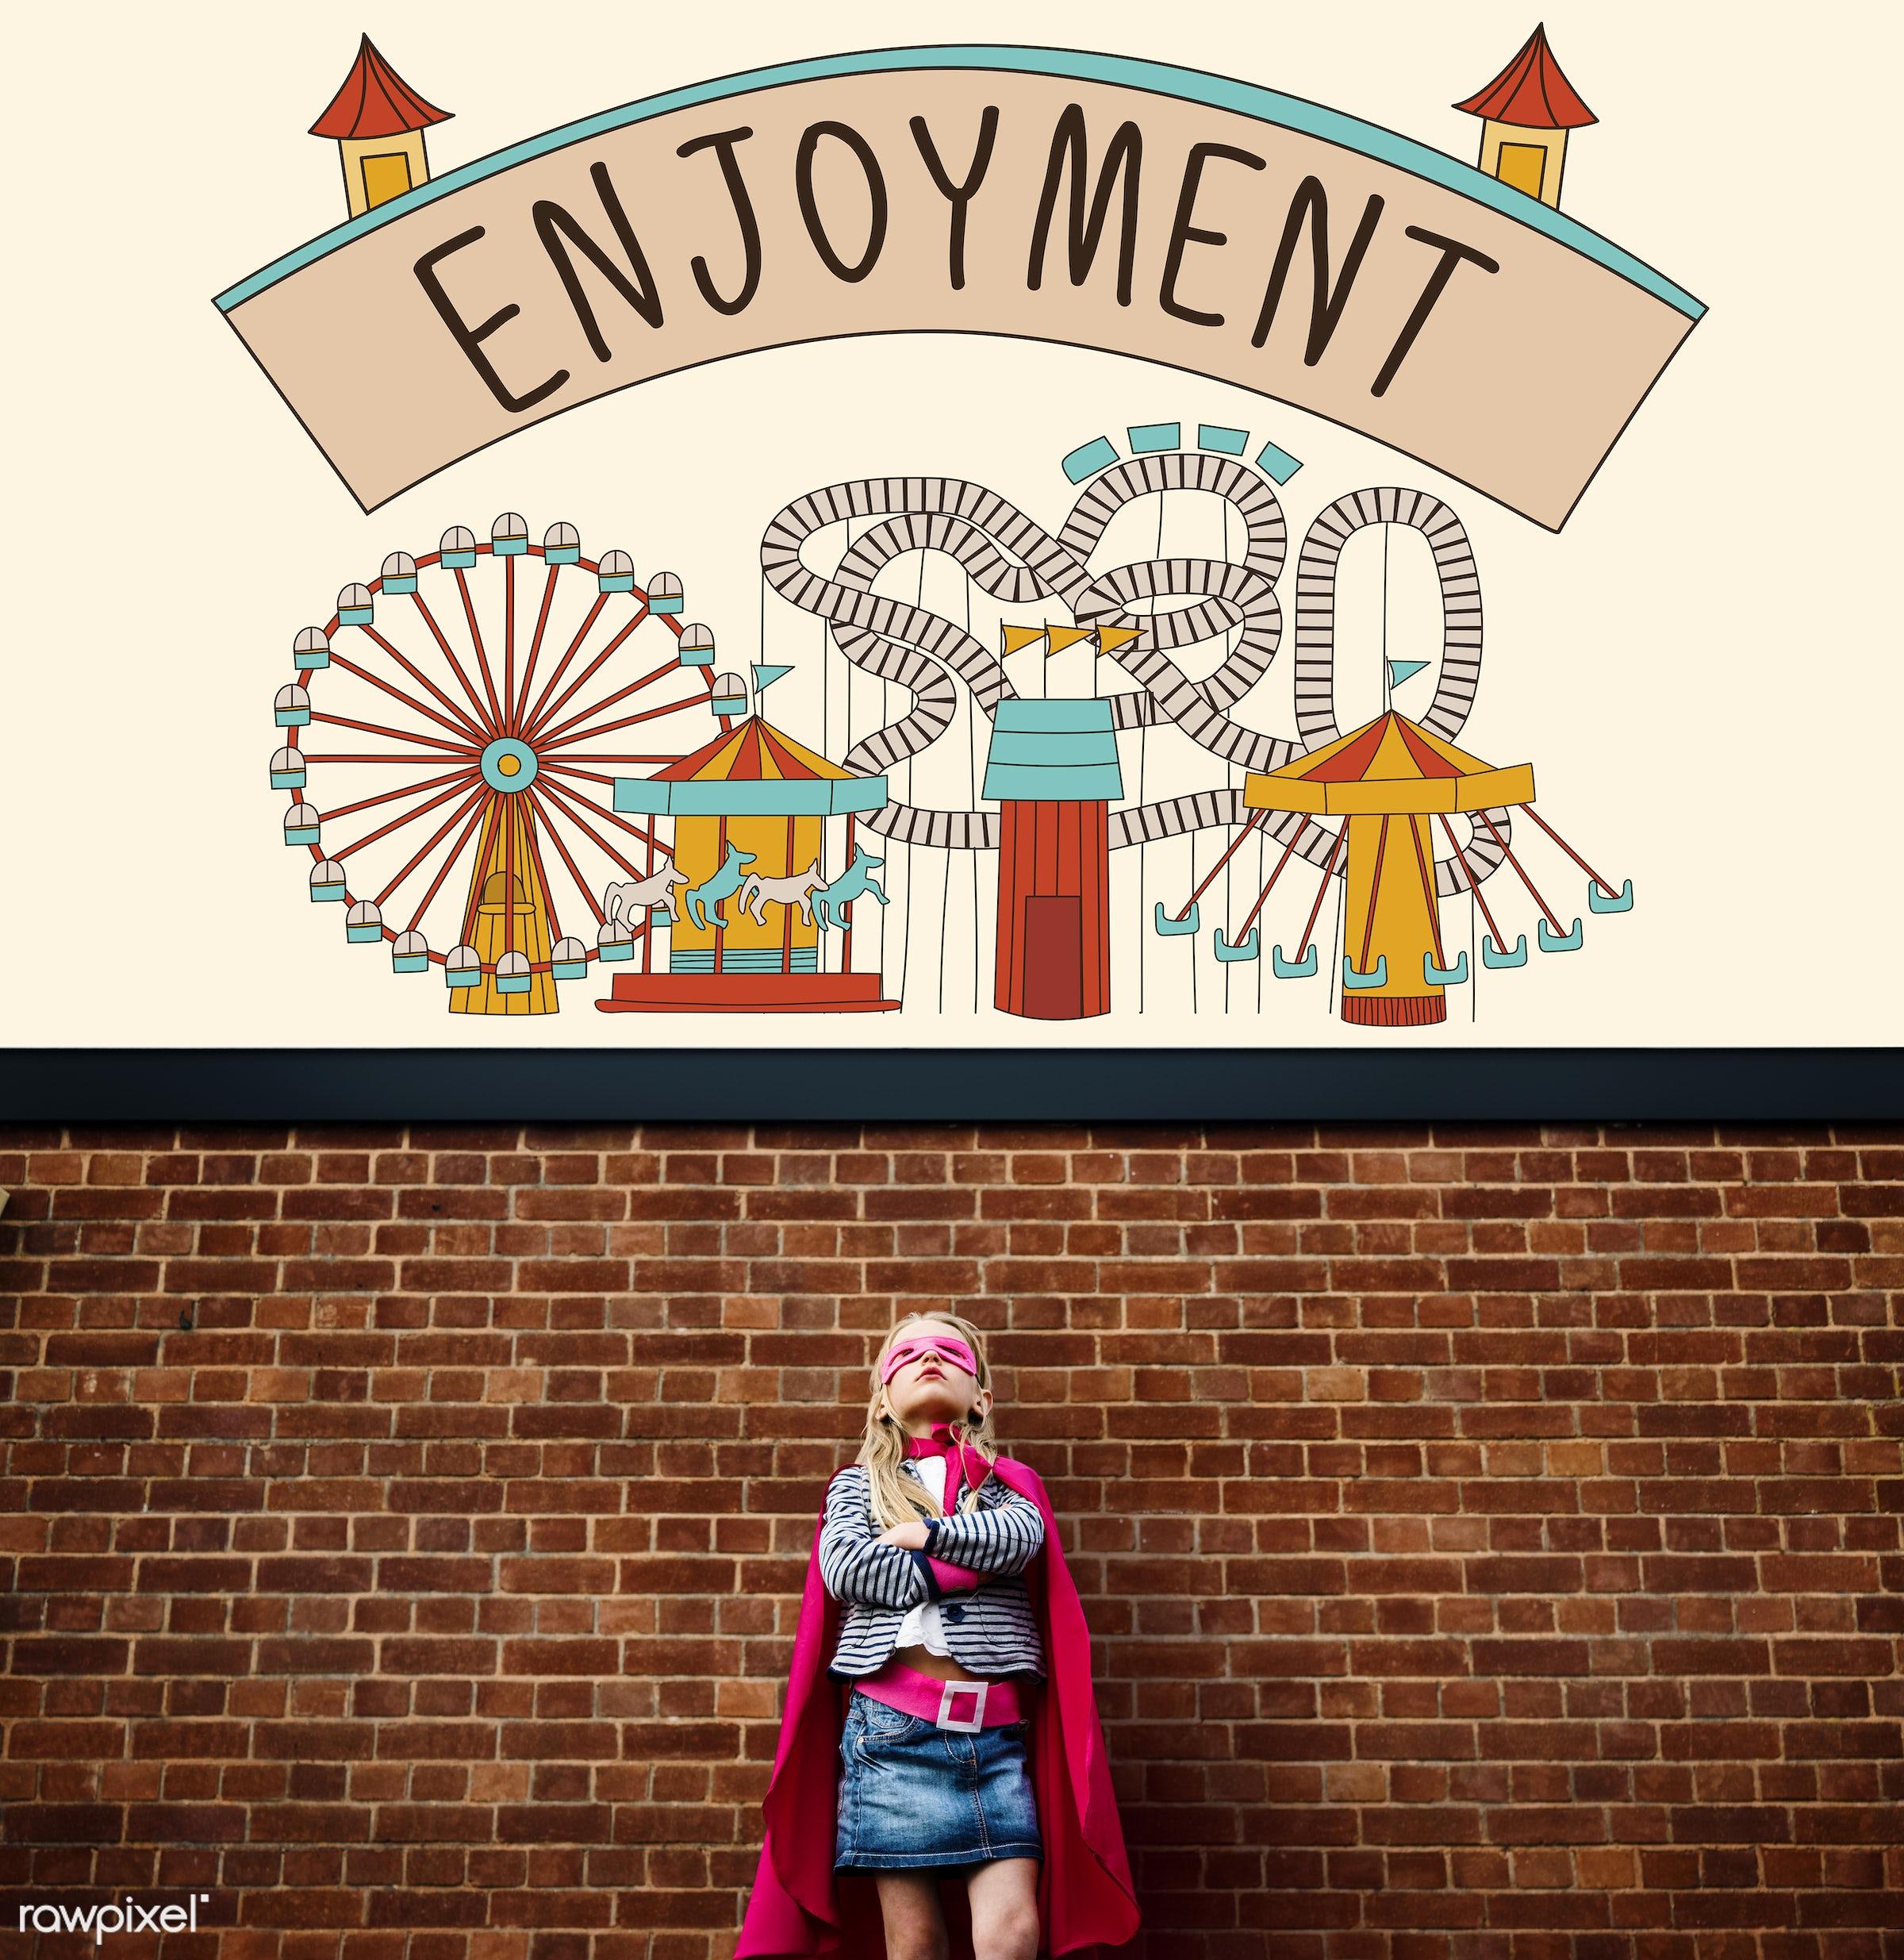 active, amusement, attraction, brave, child, childhood, costume, creative, doodle, dream, dressed up, enjoy, enjoyment,...